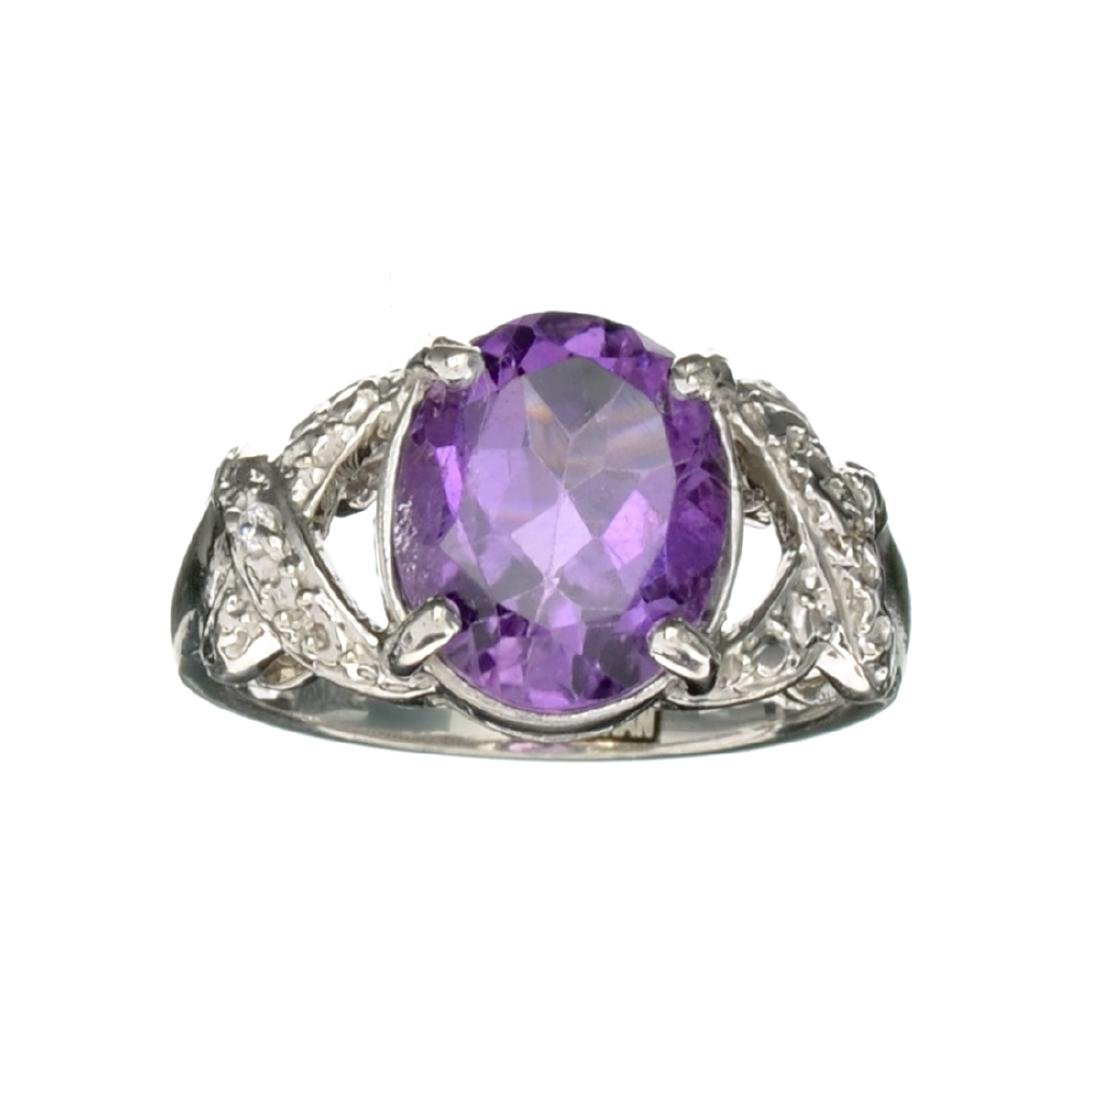 APP: 0.5k Fine Jewelry Designer Sebastian, 3.16CT